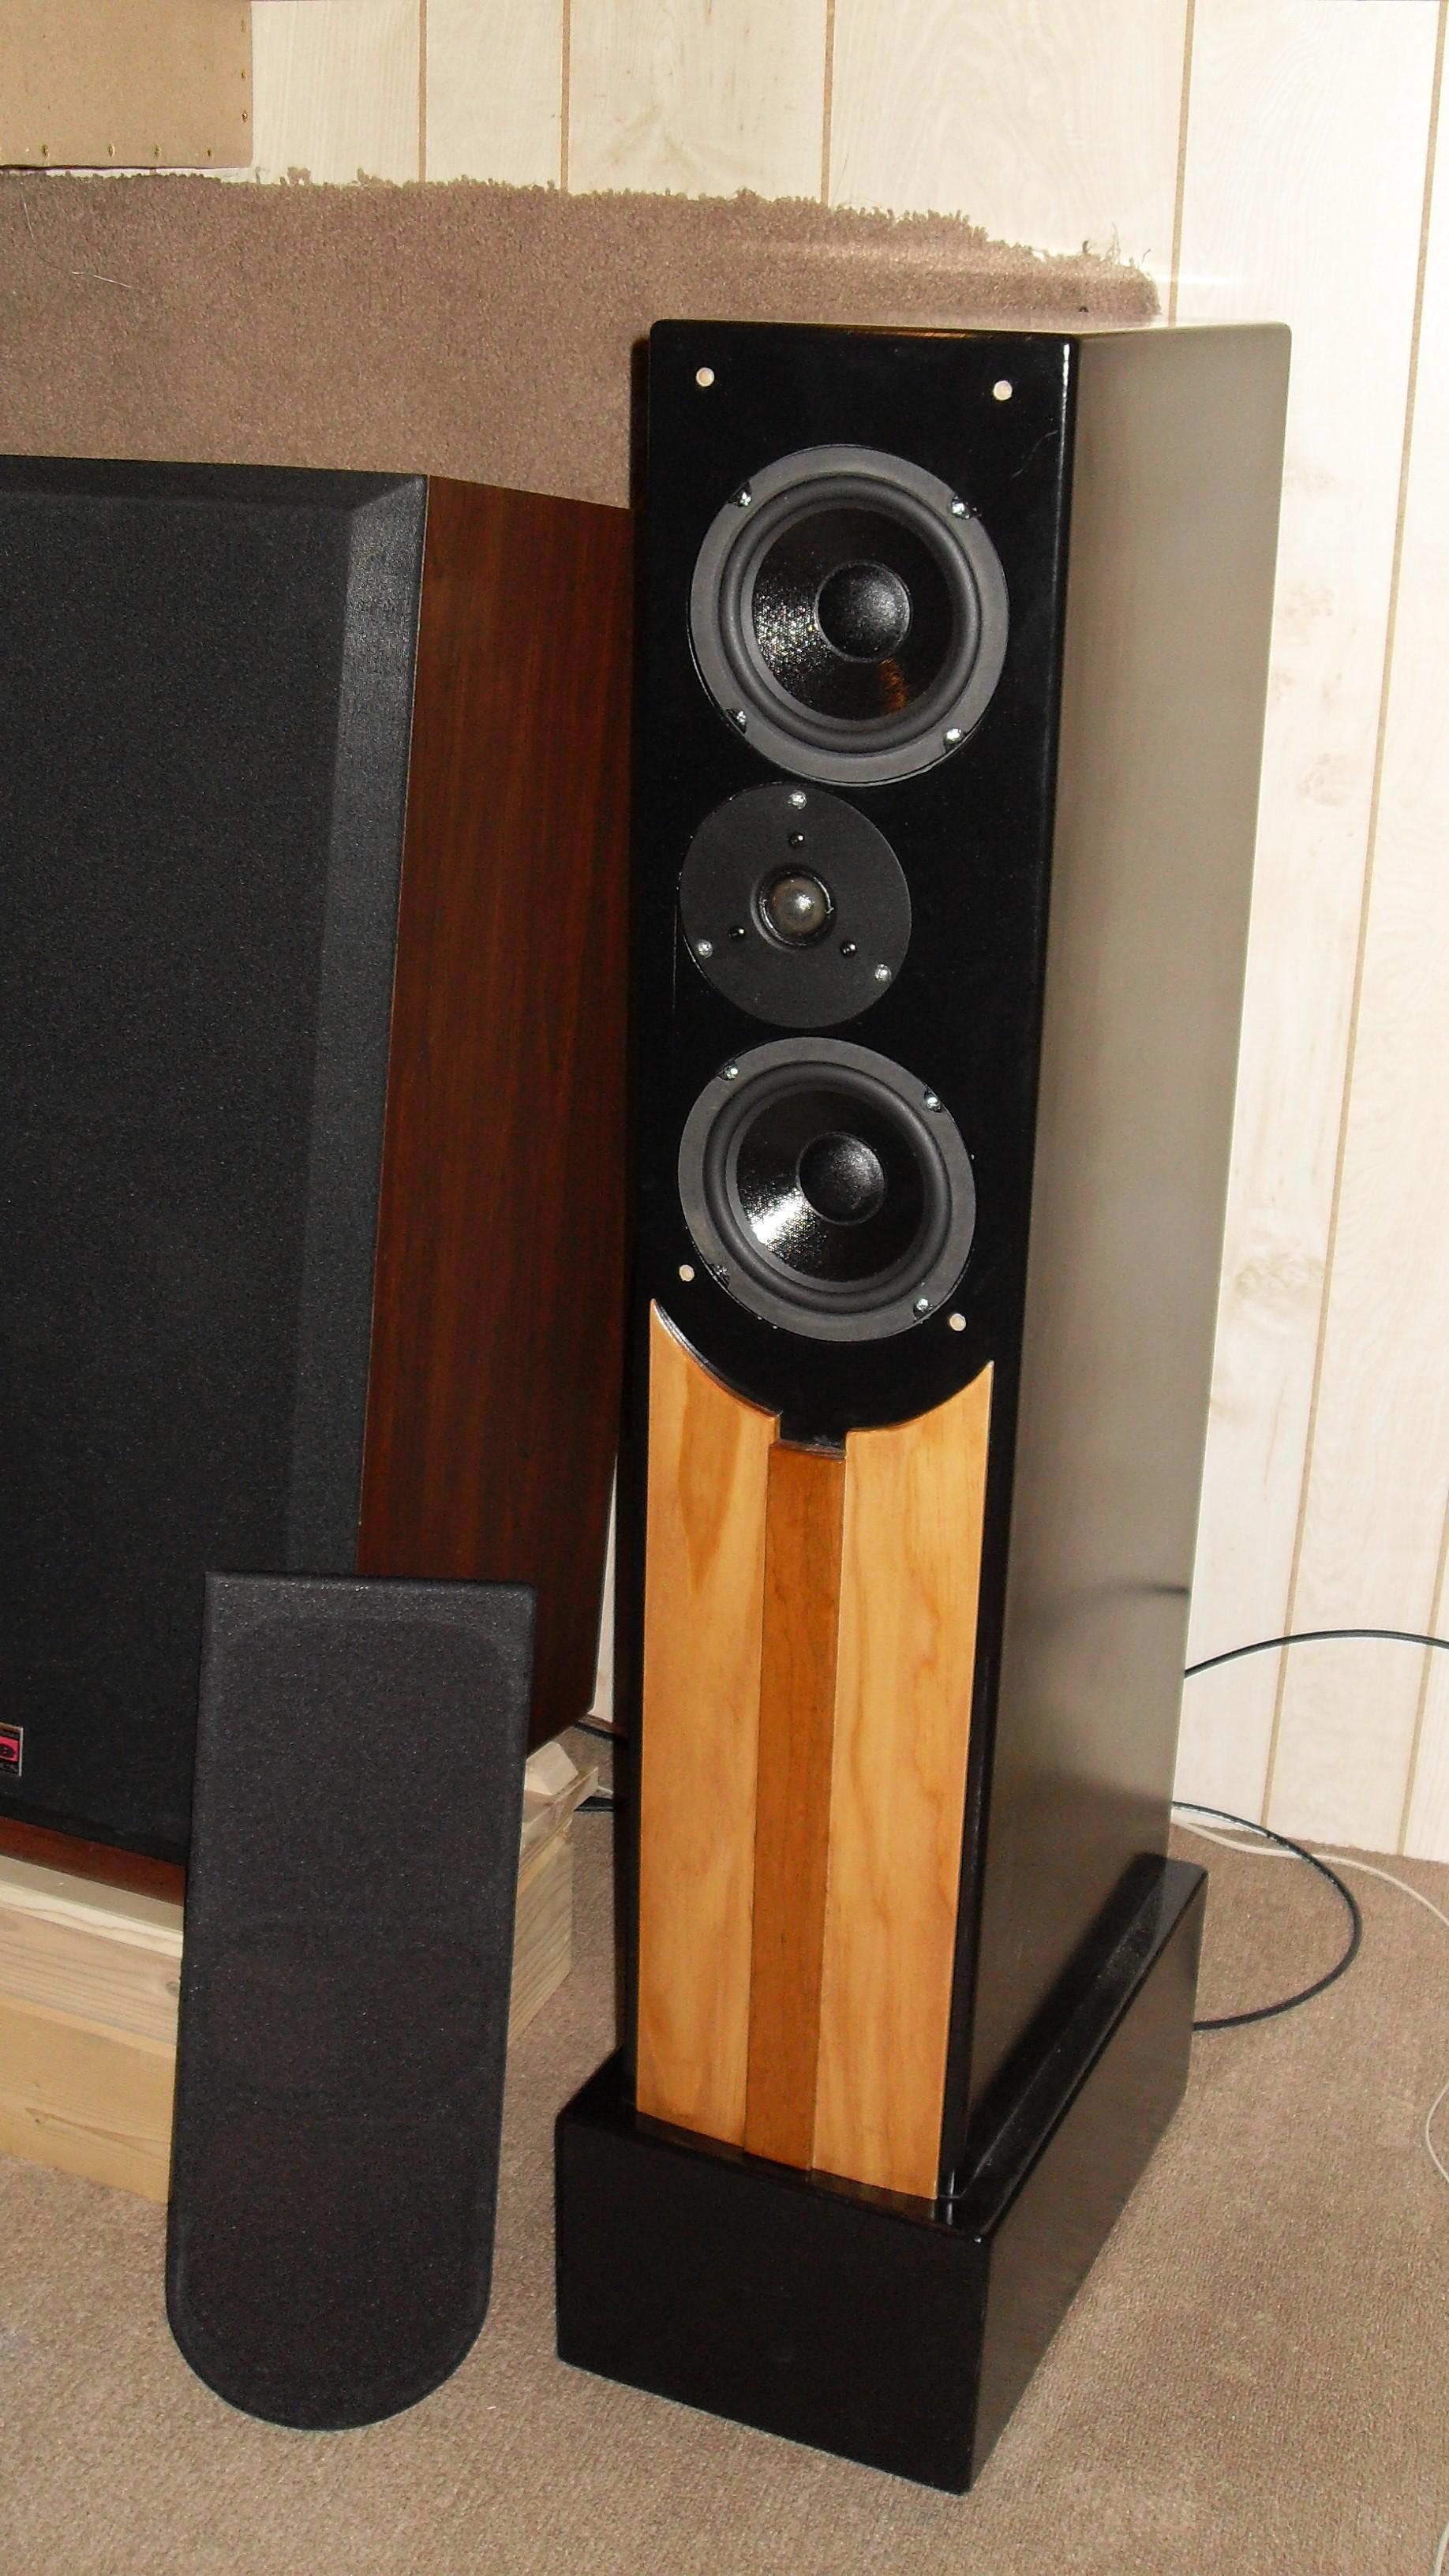 TriTrix speakers